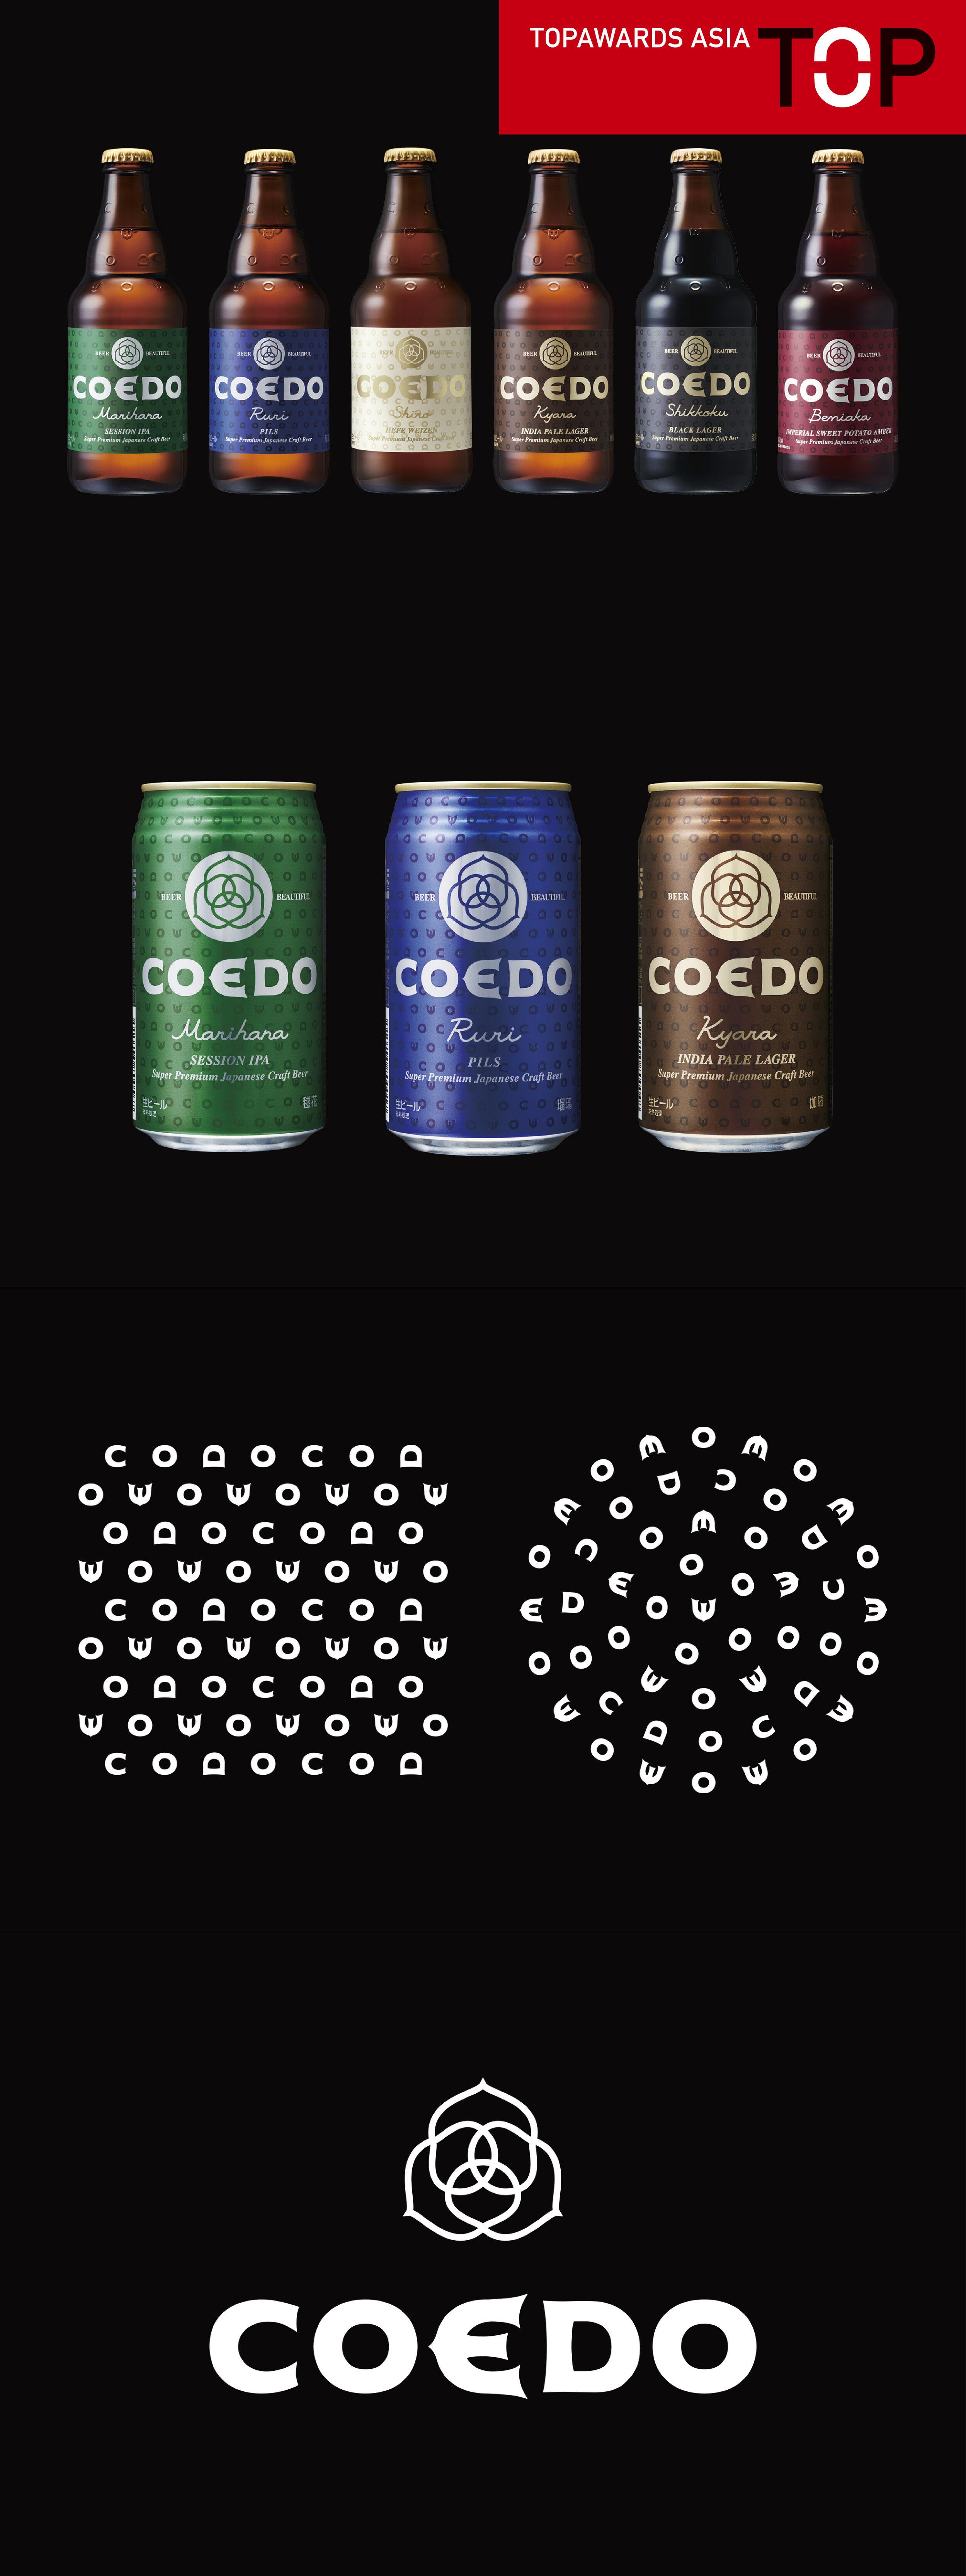 coedo_HP_part 2.jpg